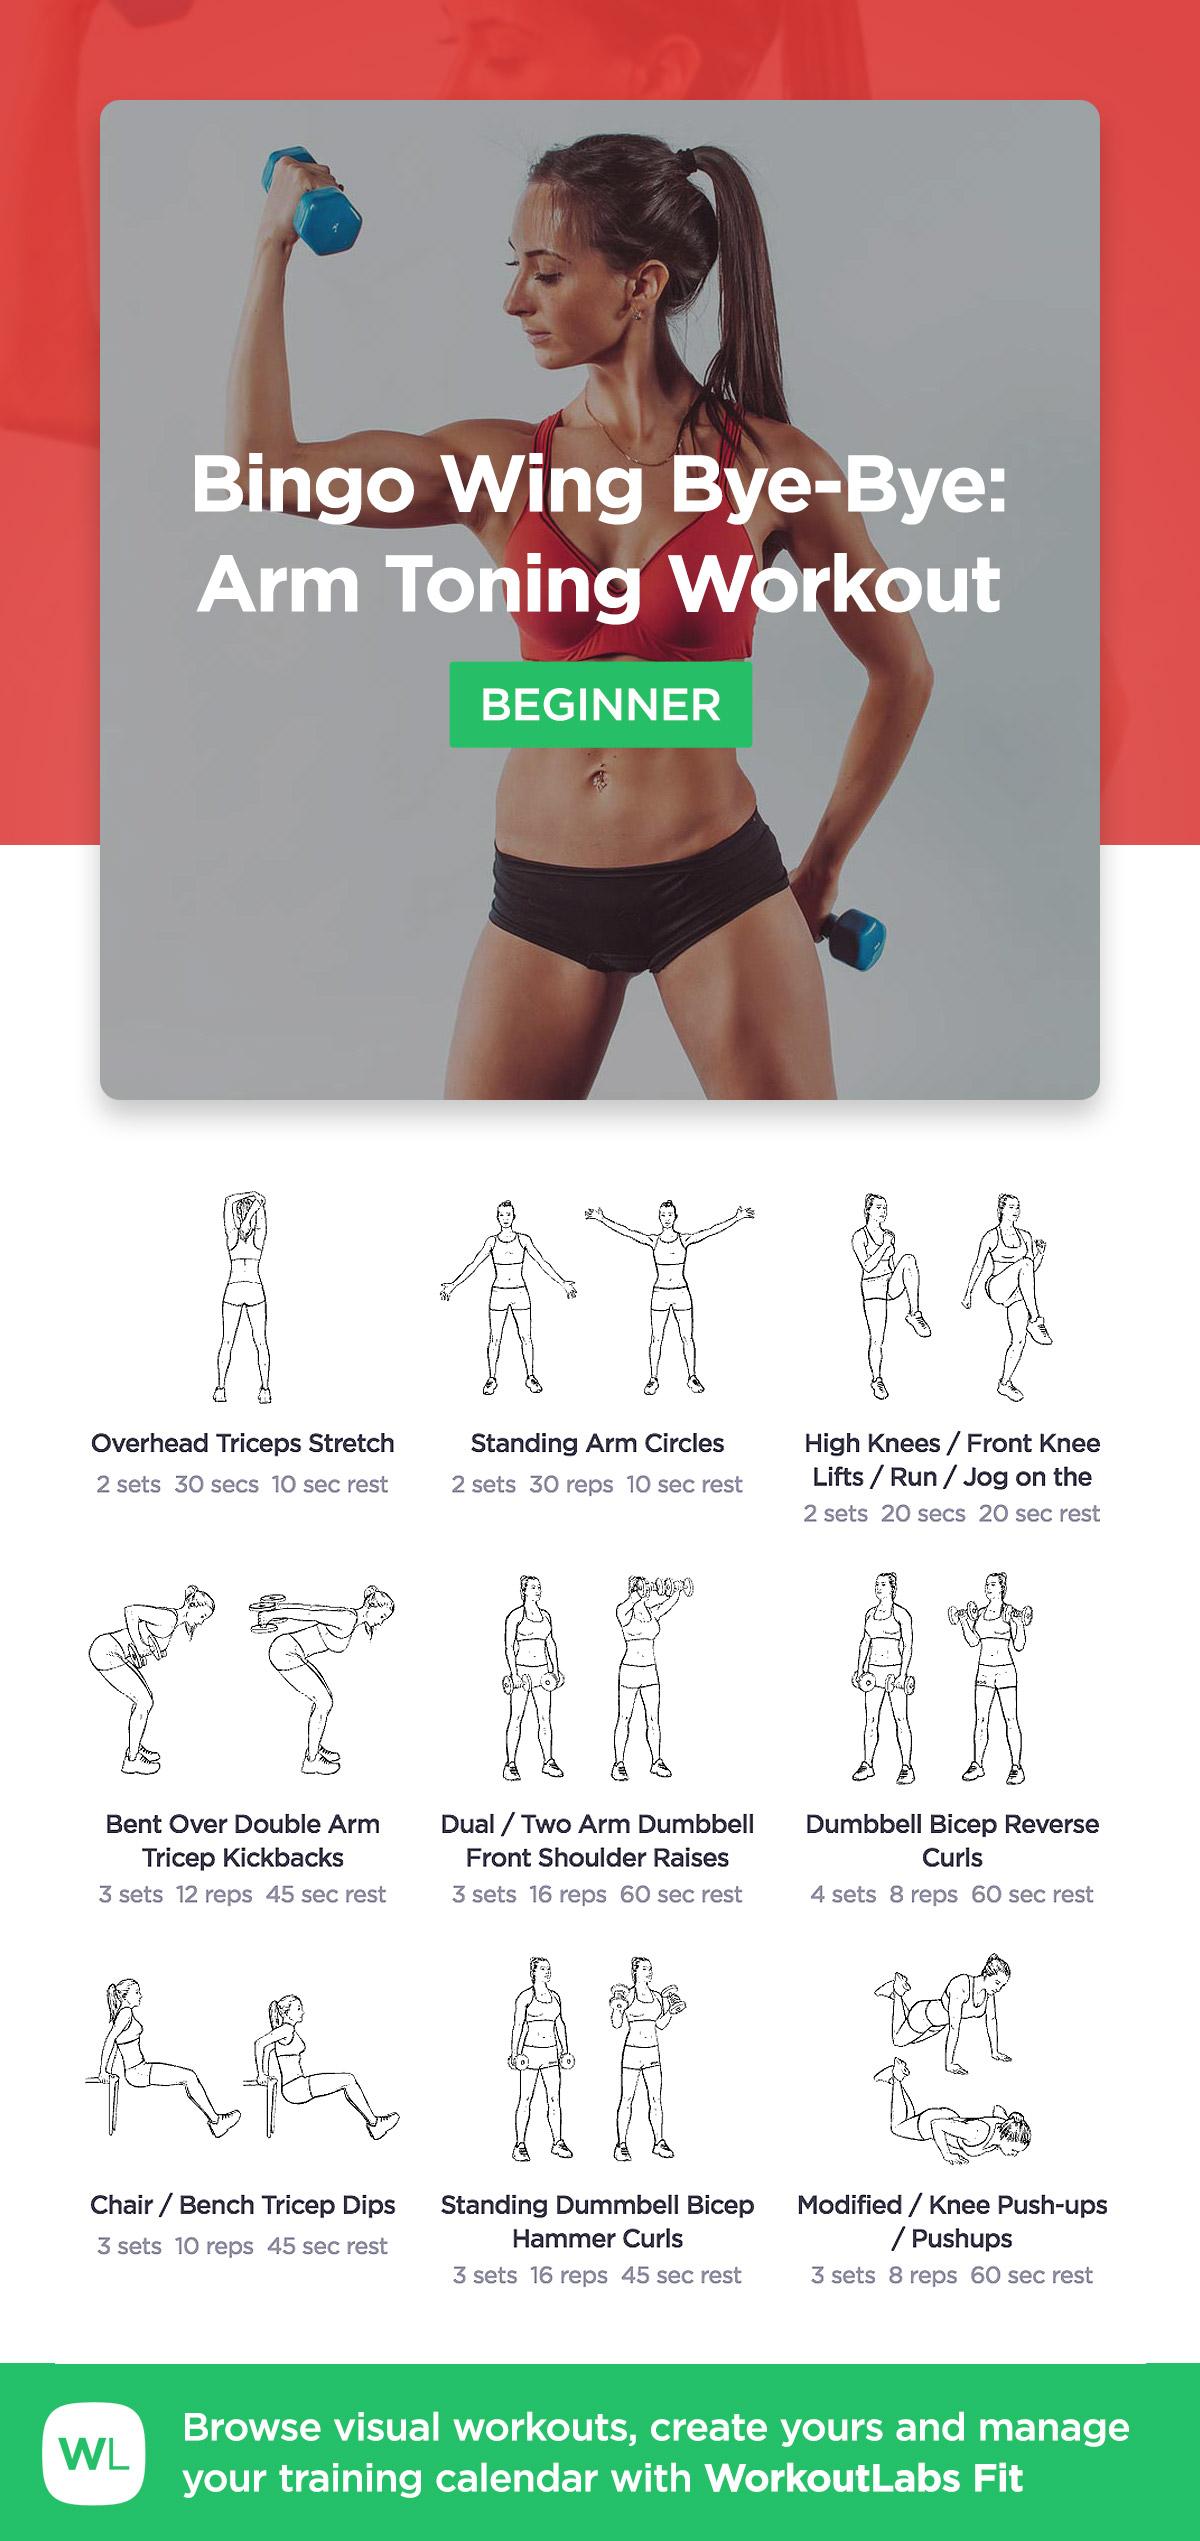 Bingo Wing Bye Bye Arm Toning Workout · WorkoutLabs Fit